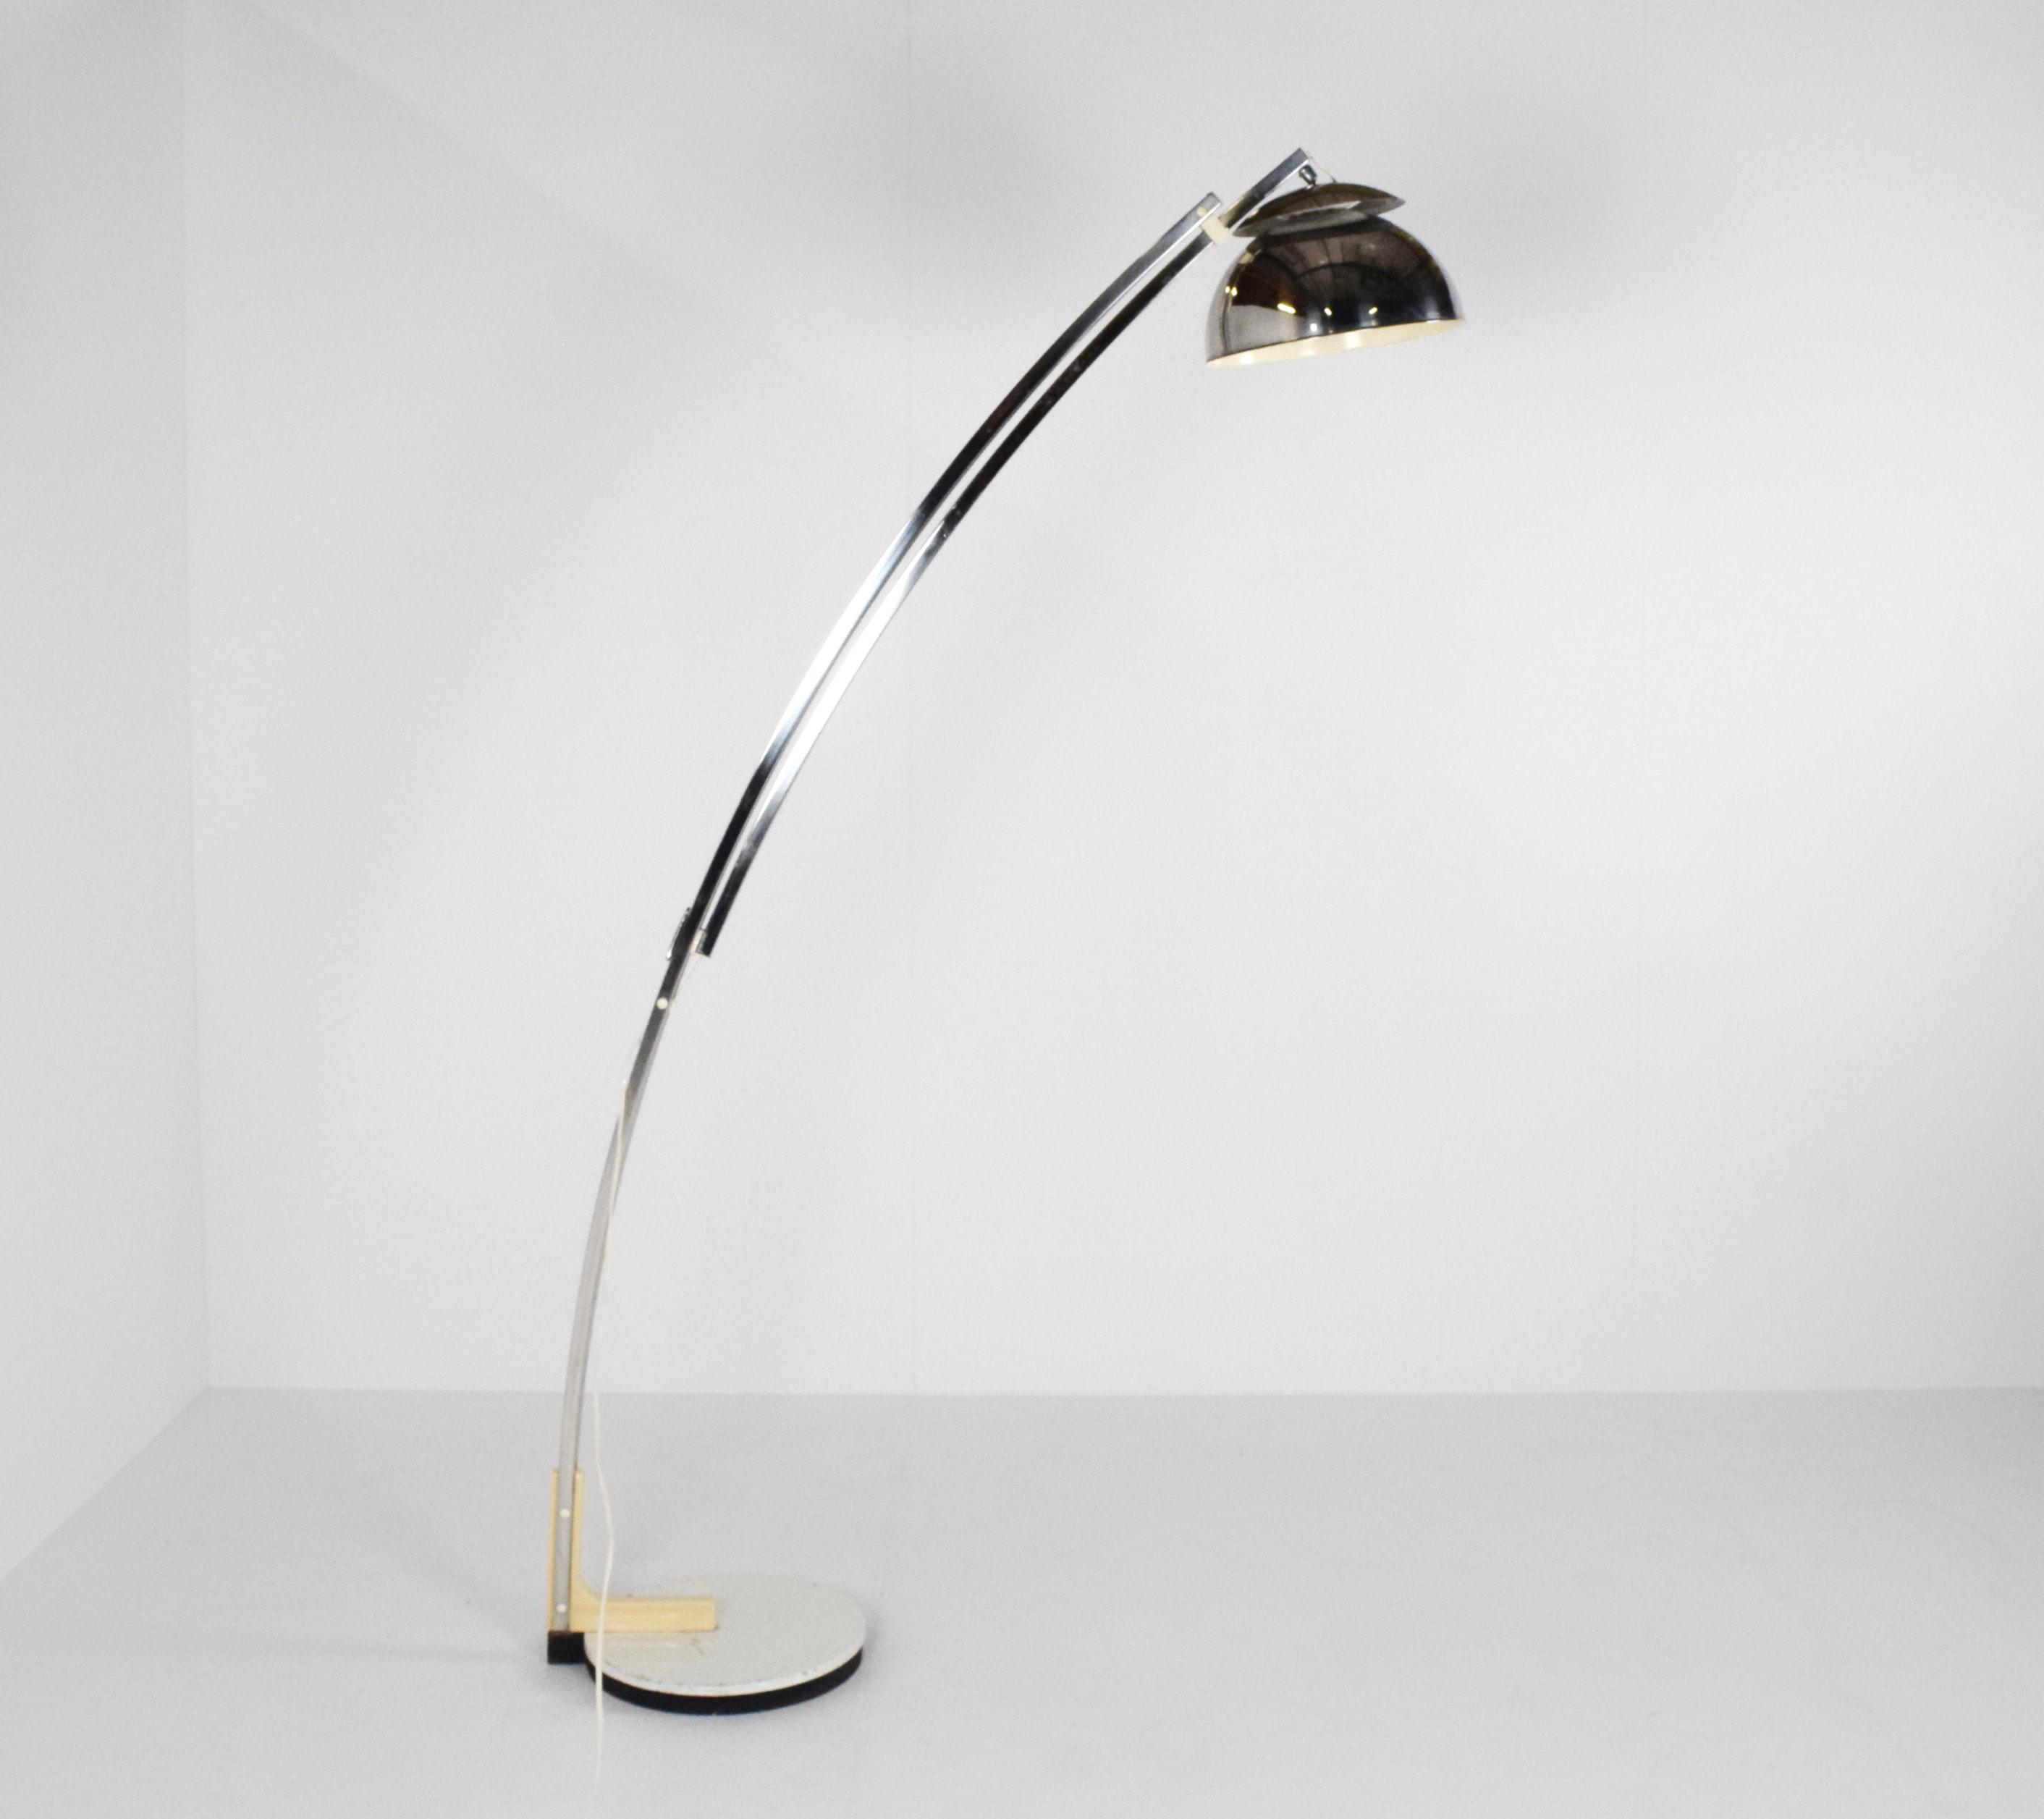 Goffredo Reggiani Adjustable Chrome Arc Floor Lamp, Italy 1970's